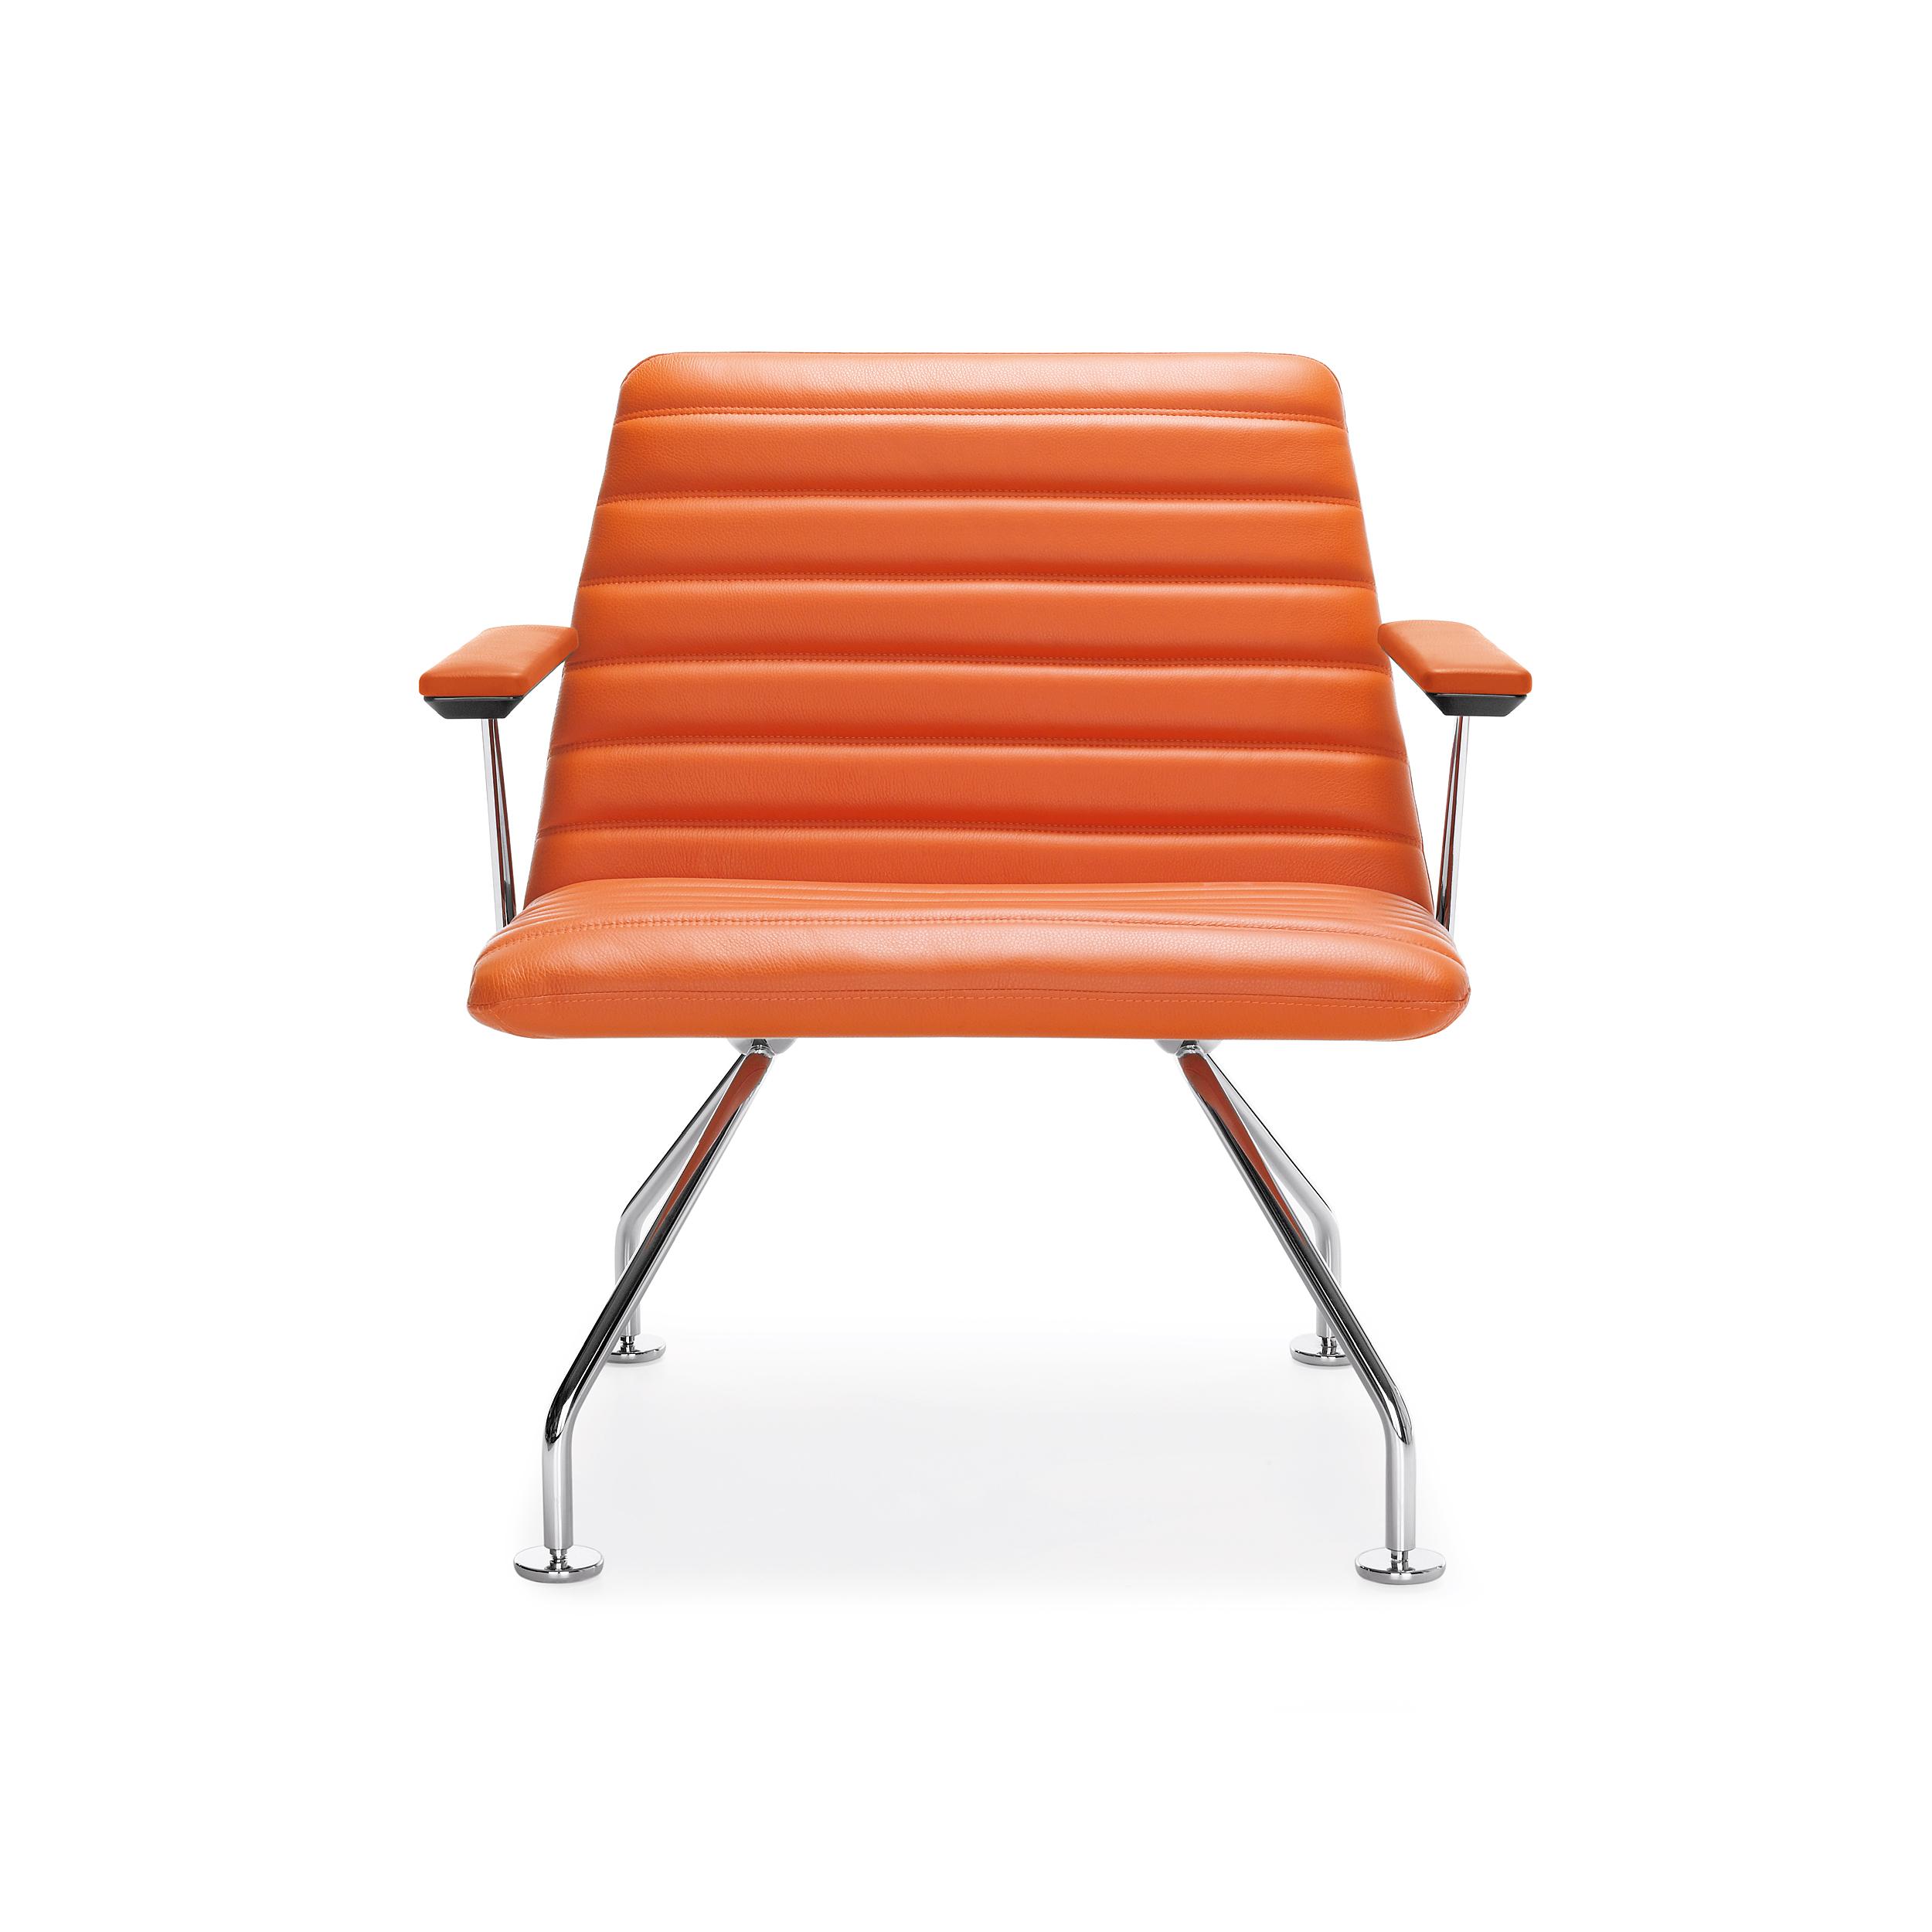 soft-seating_1-1_Hello!-6.jpg